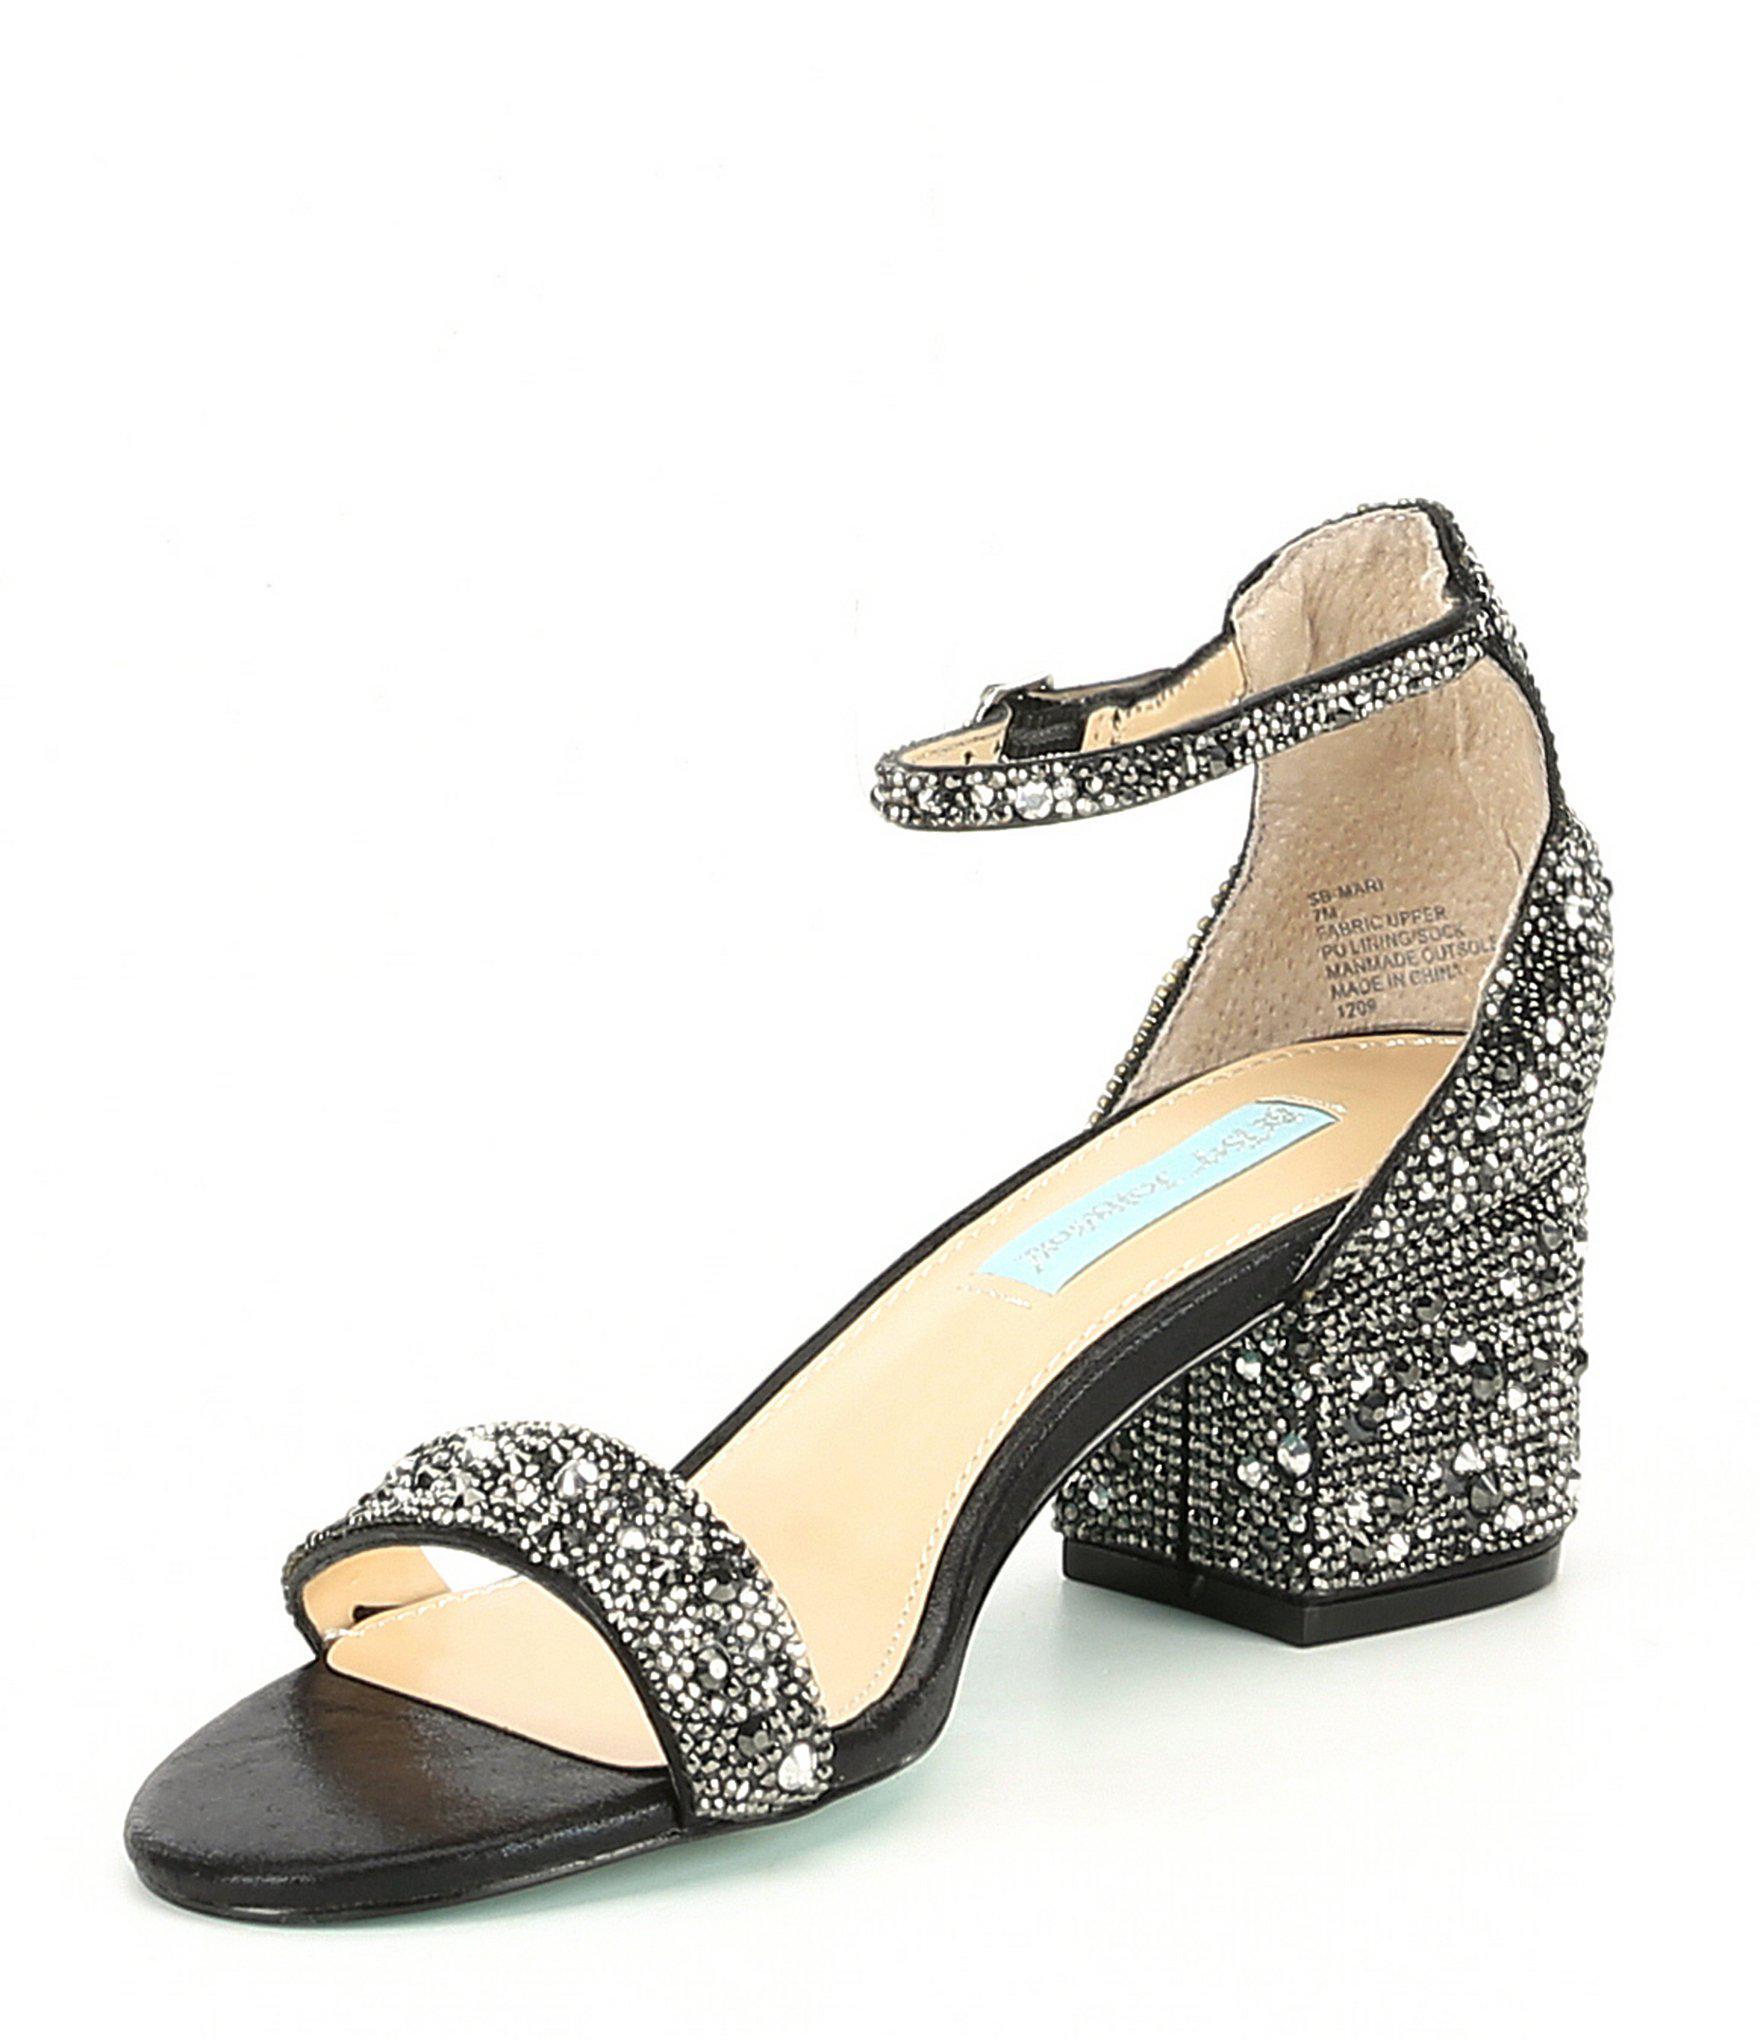 1a1c62ebc58 Betsey Johnson - Black Blue By Mari Block Heel Dress Sandals - Lyst. View  fullscreen